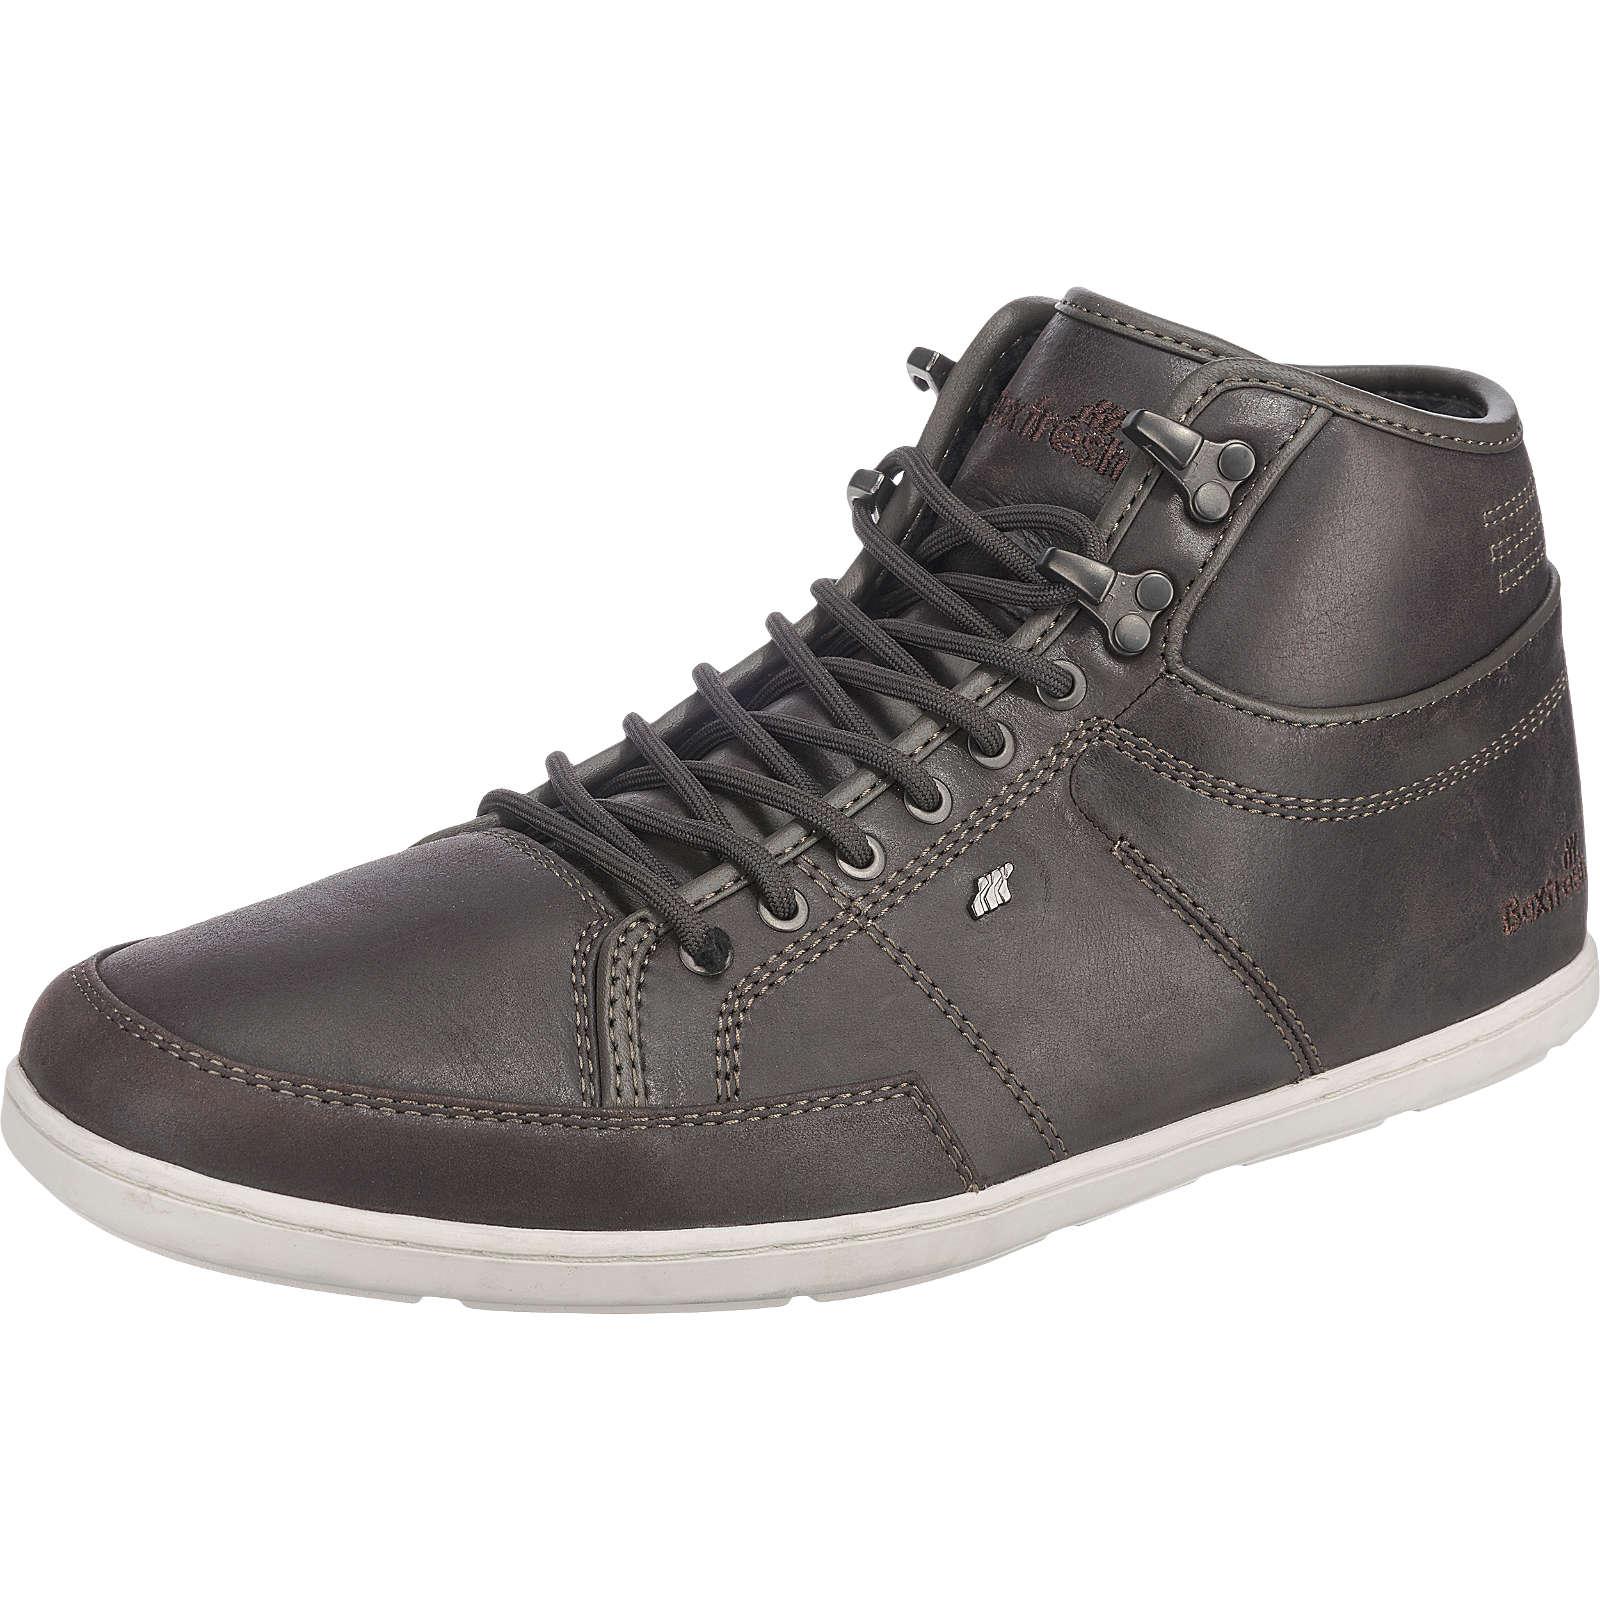 Boxfresh® Swapp 3 Sneakers khaki Herren Gr. 42